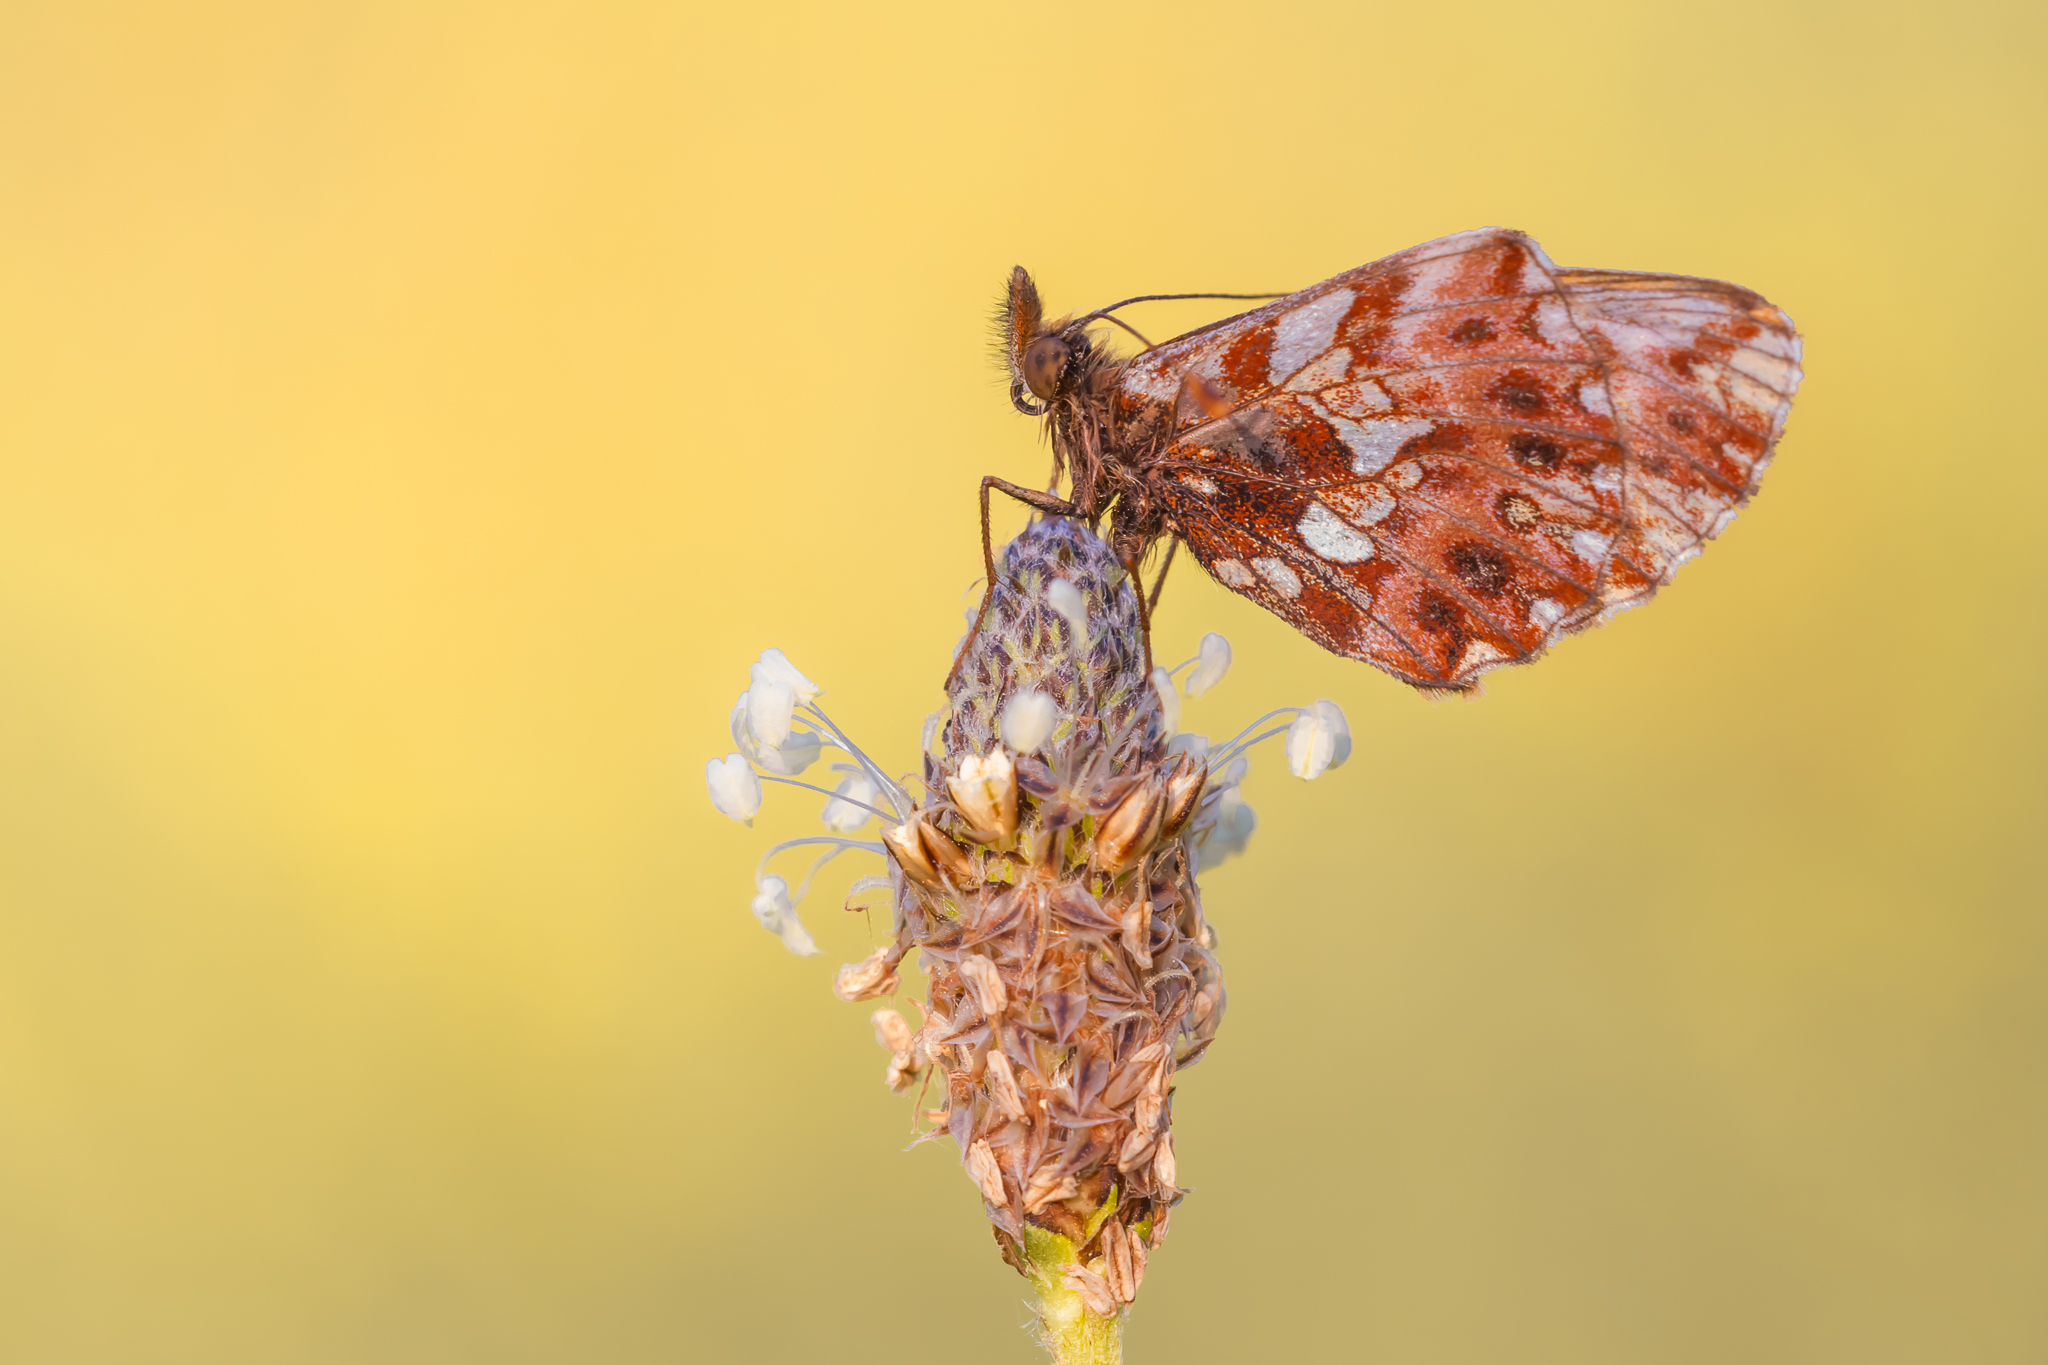 Leo Deknatel, Vlinders fotograferen, Vlinderfotografie